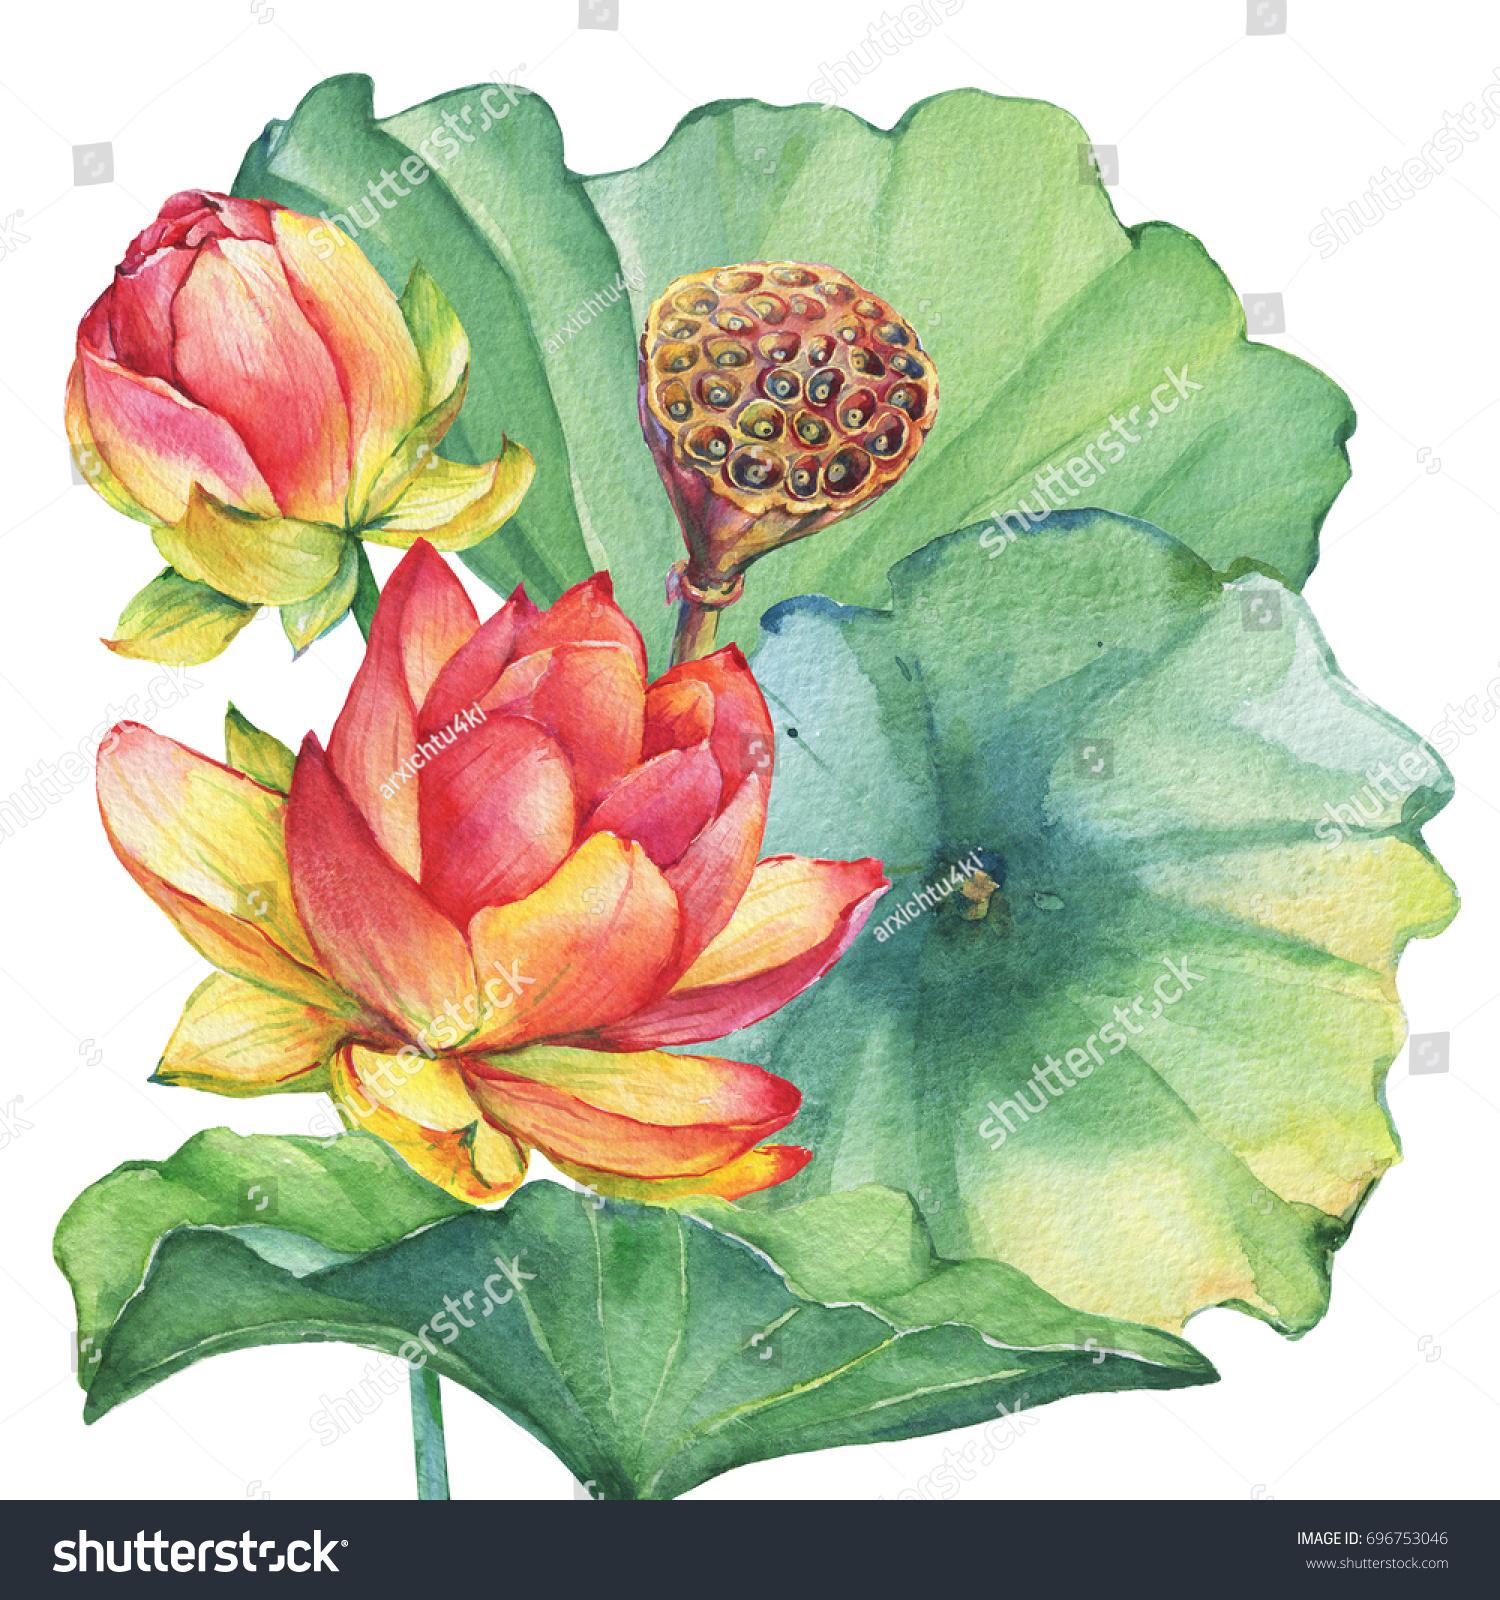 Poster arrangement pink indian lotus flower stock illustration poster arrangement of pink indian lotus flower with leaves seed head bud mightylinksfo